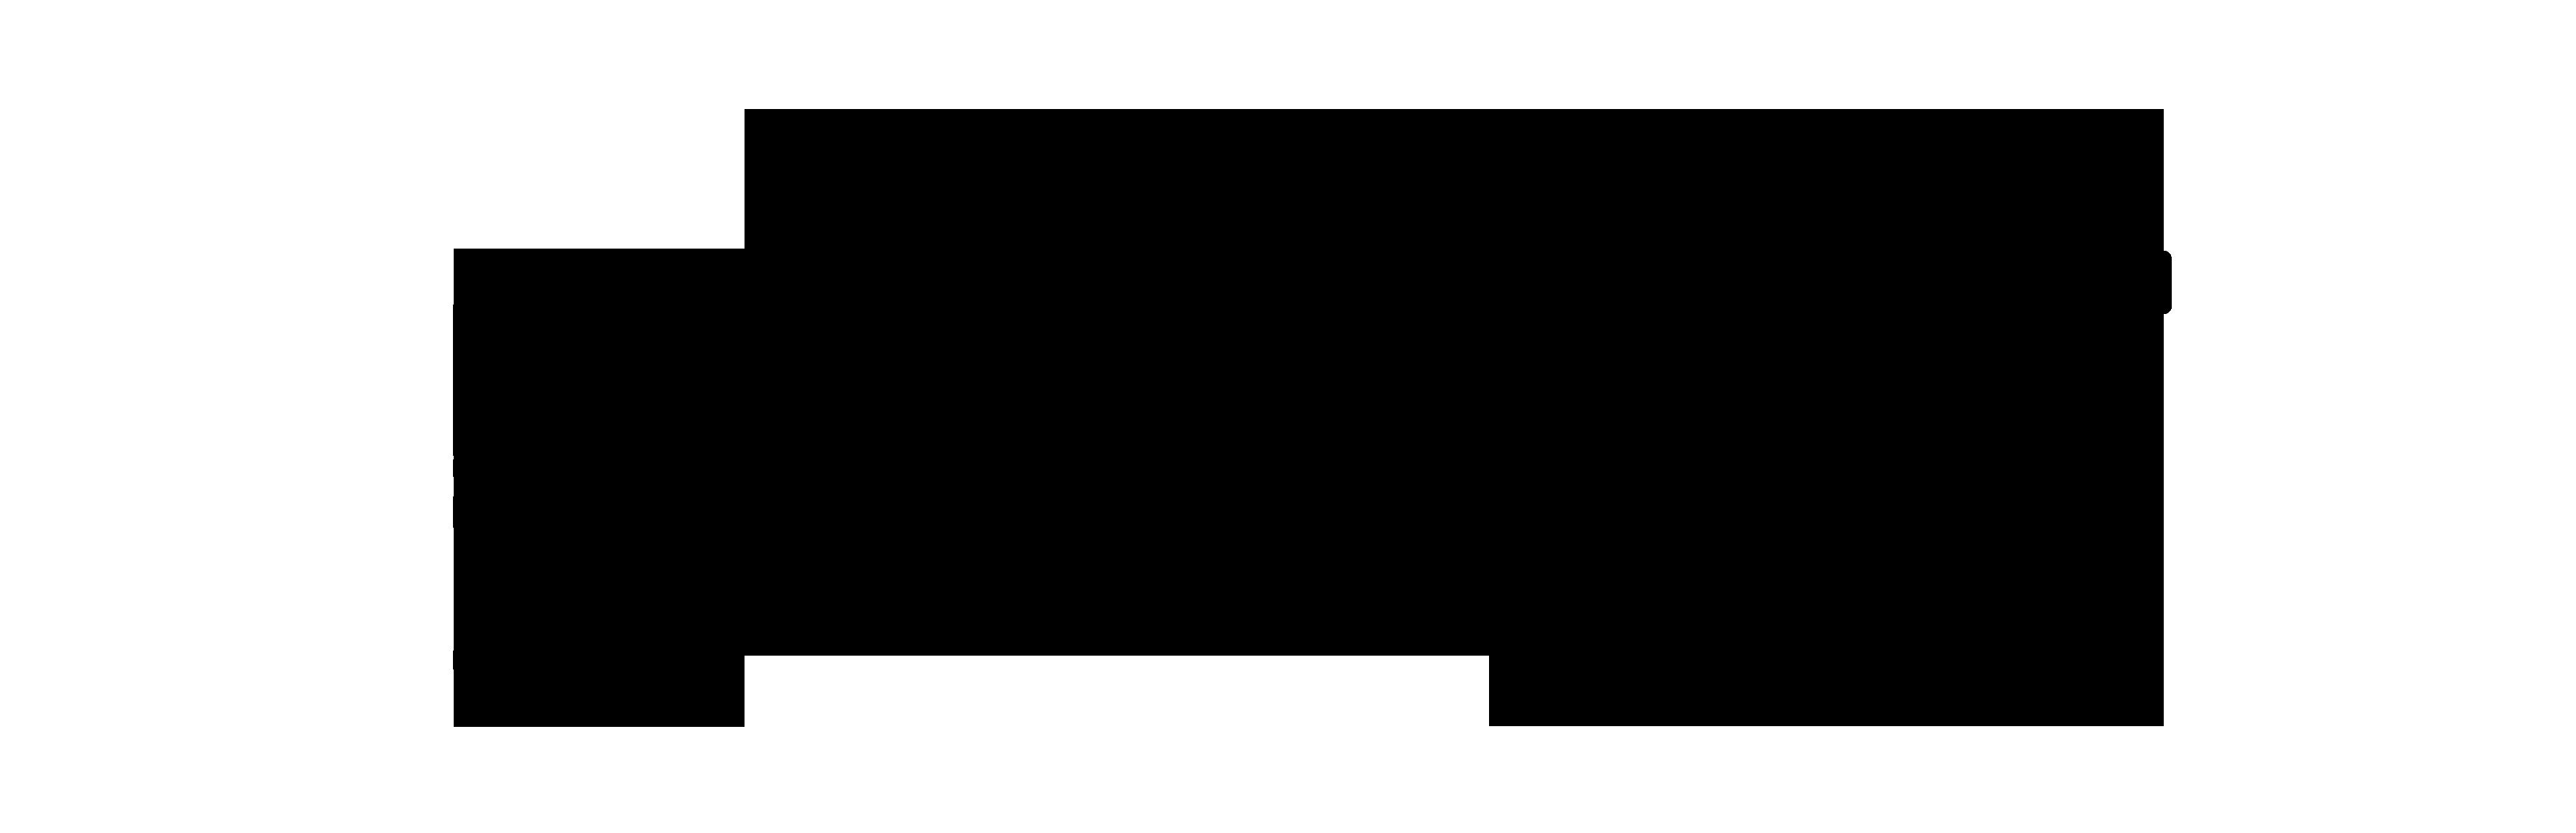 Eschilo Crossfit